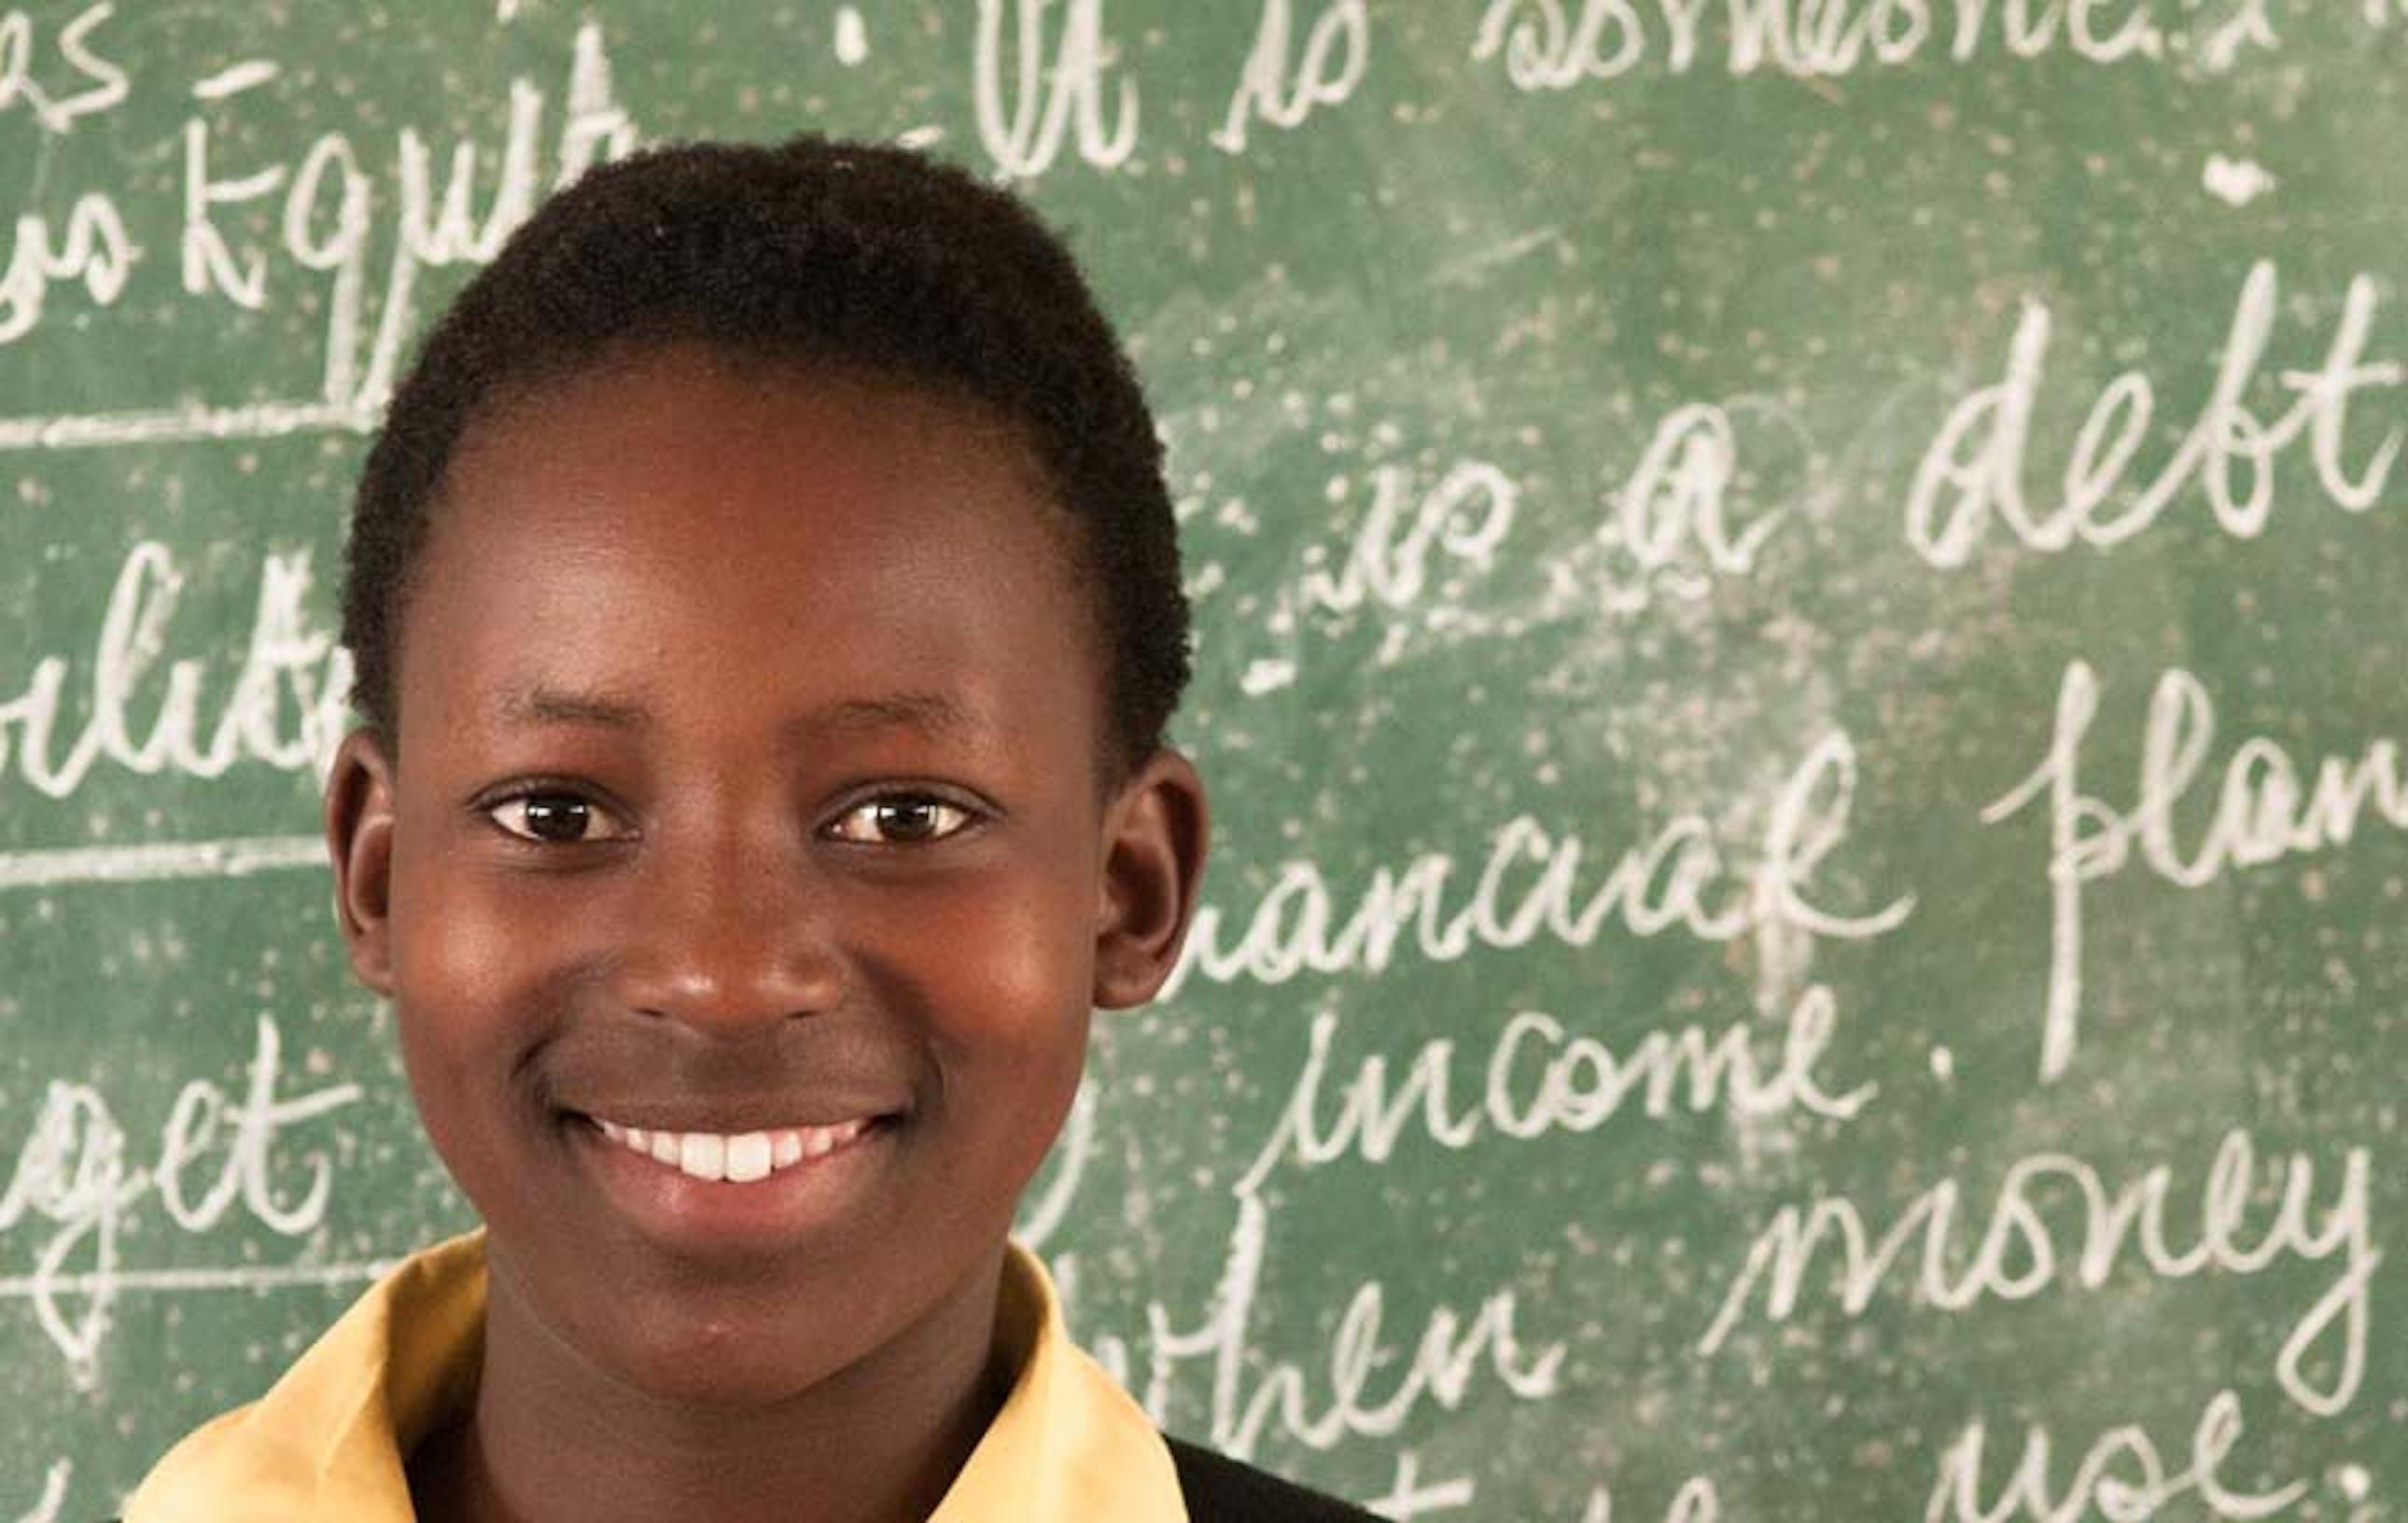 Ikea per UNICEF SoftToys4Education ©UNICEFPFPG2015_3305MiltchevaSOUTH AFRICA 2015